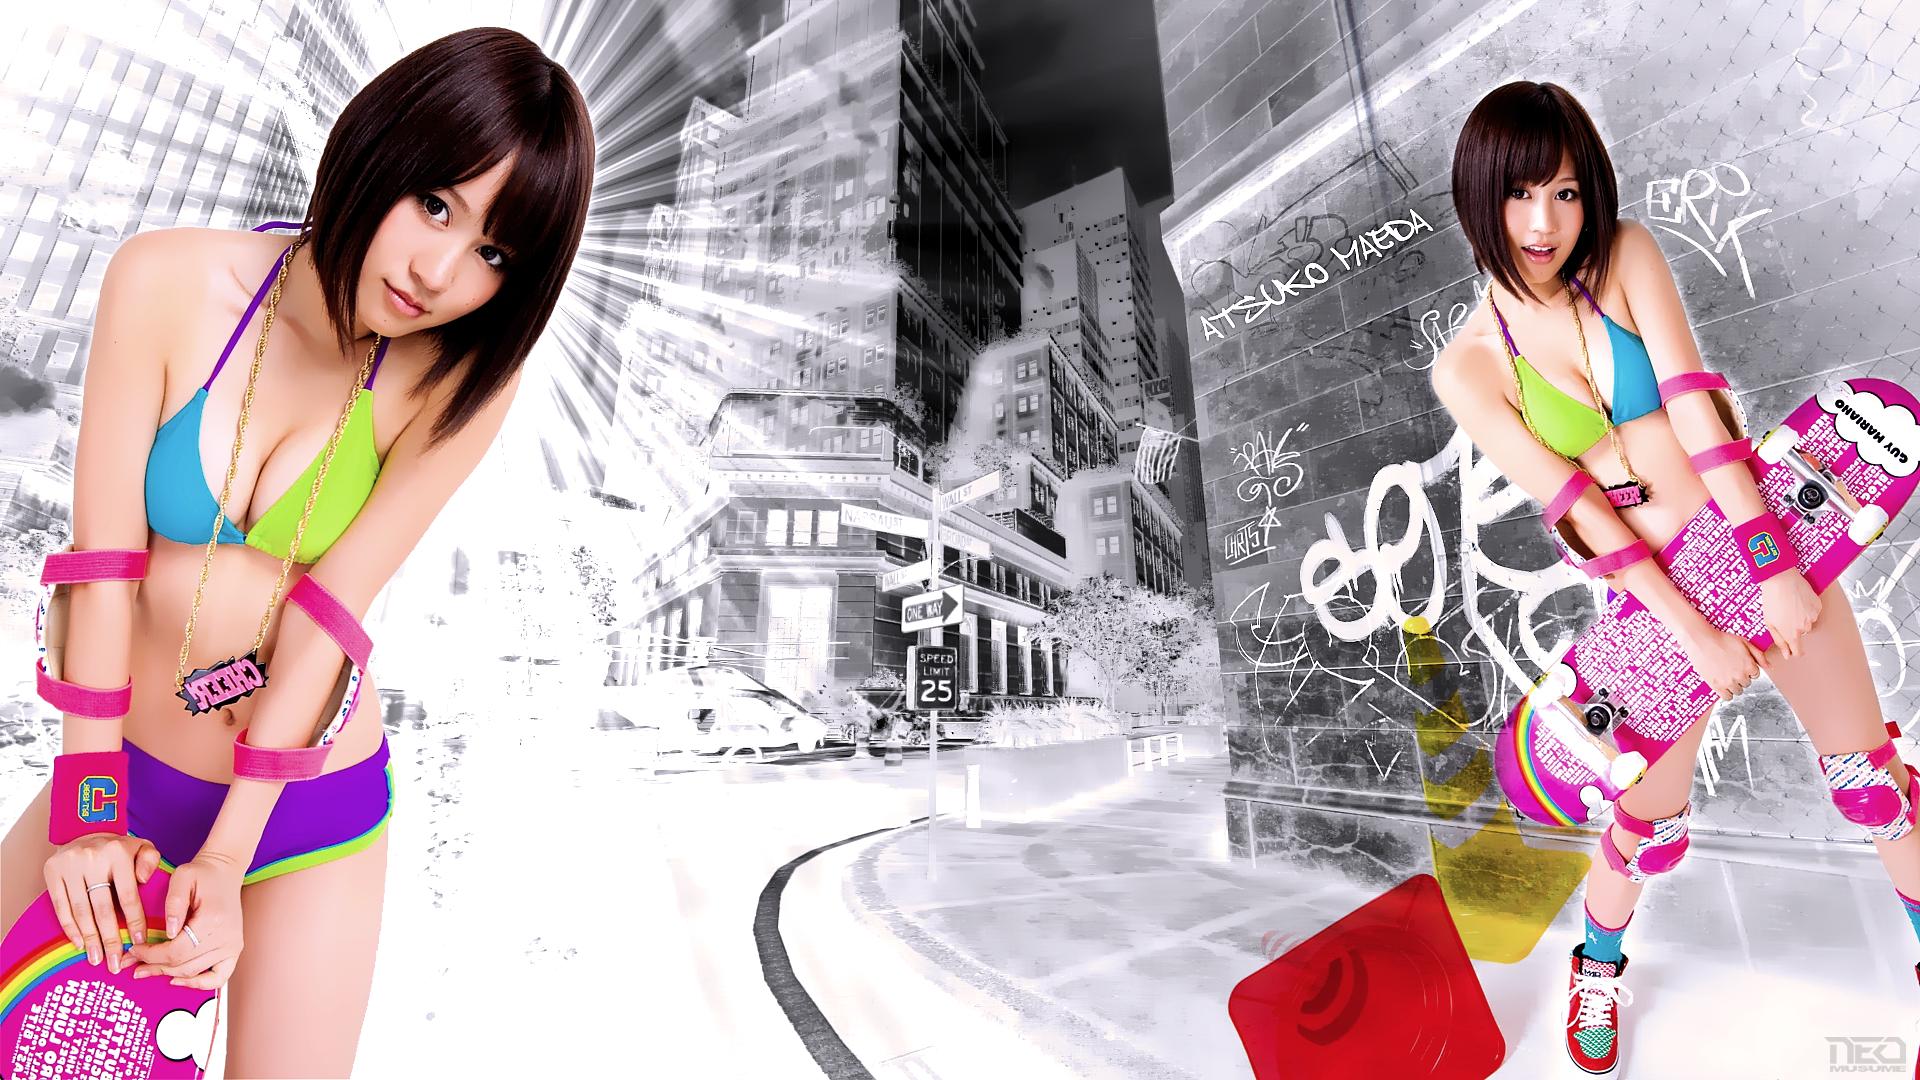 Atsuko Street by NEO-Musume